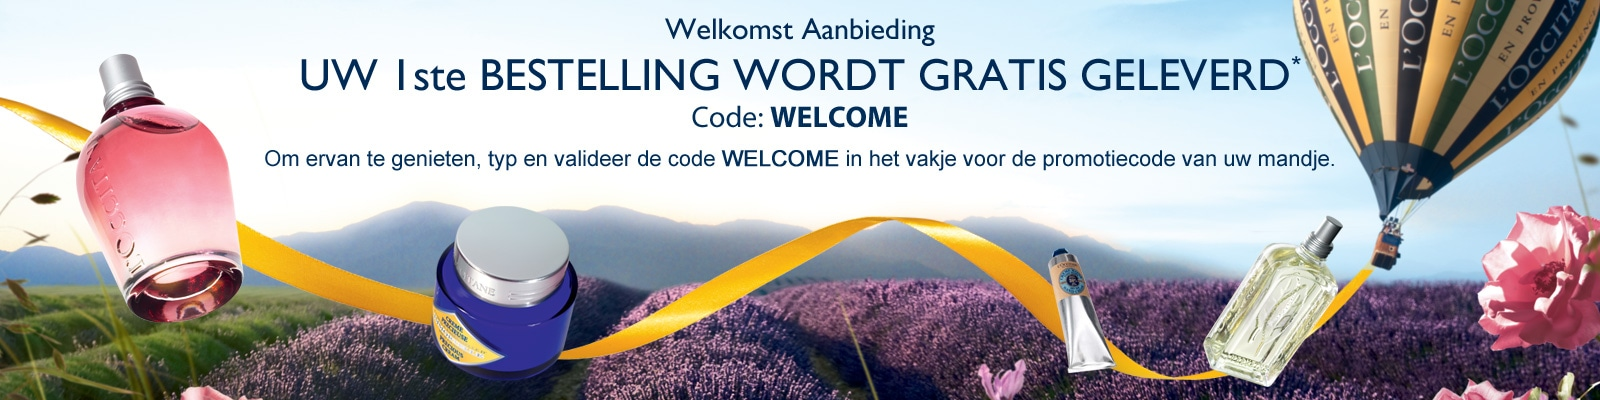 Welkomst Aanbieding - L'Occitane Nederland